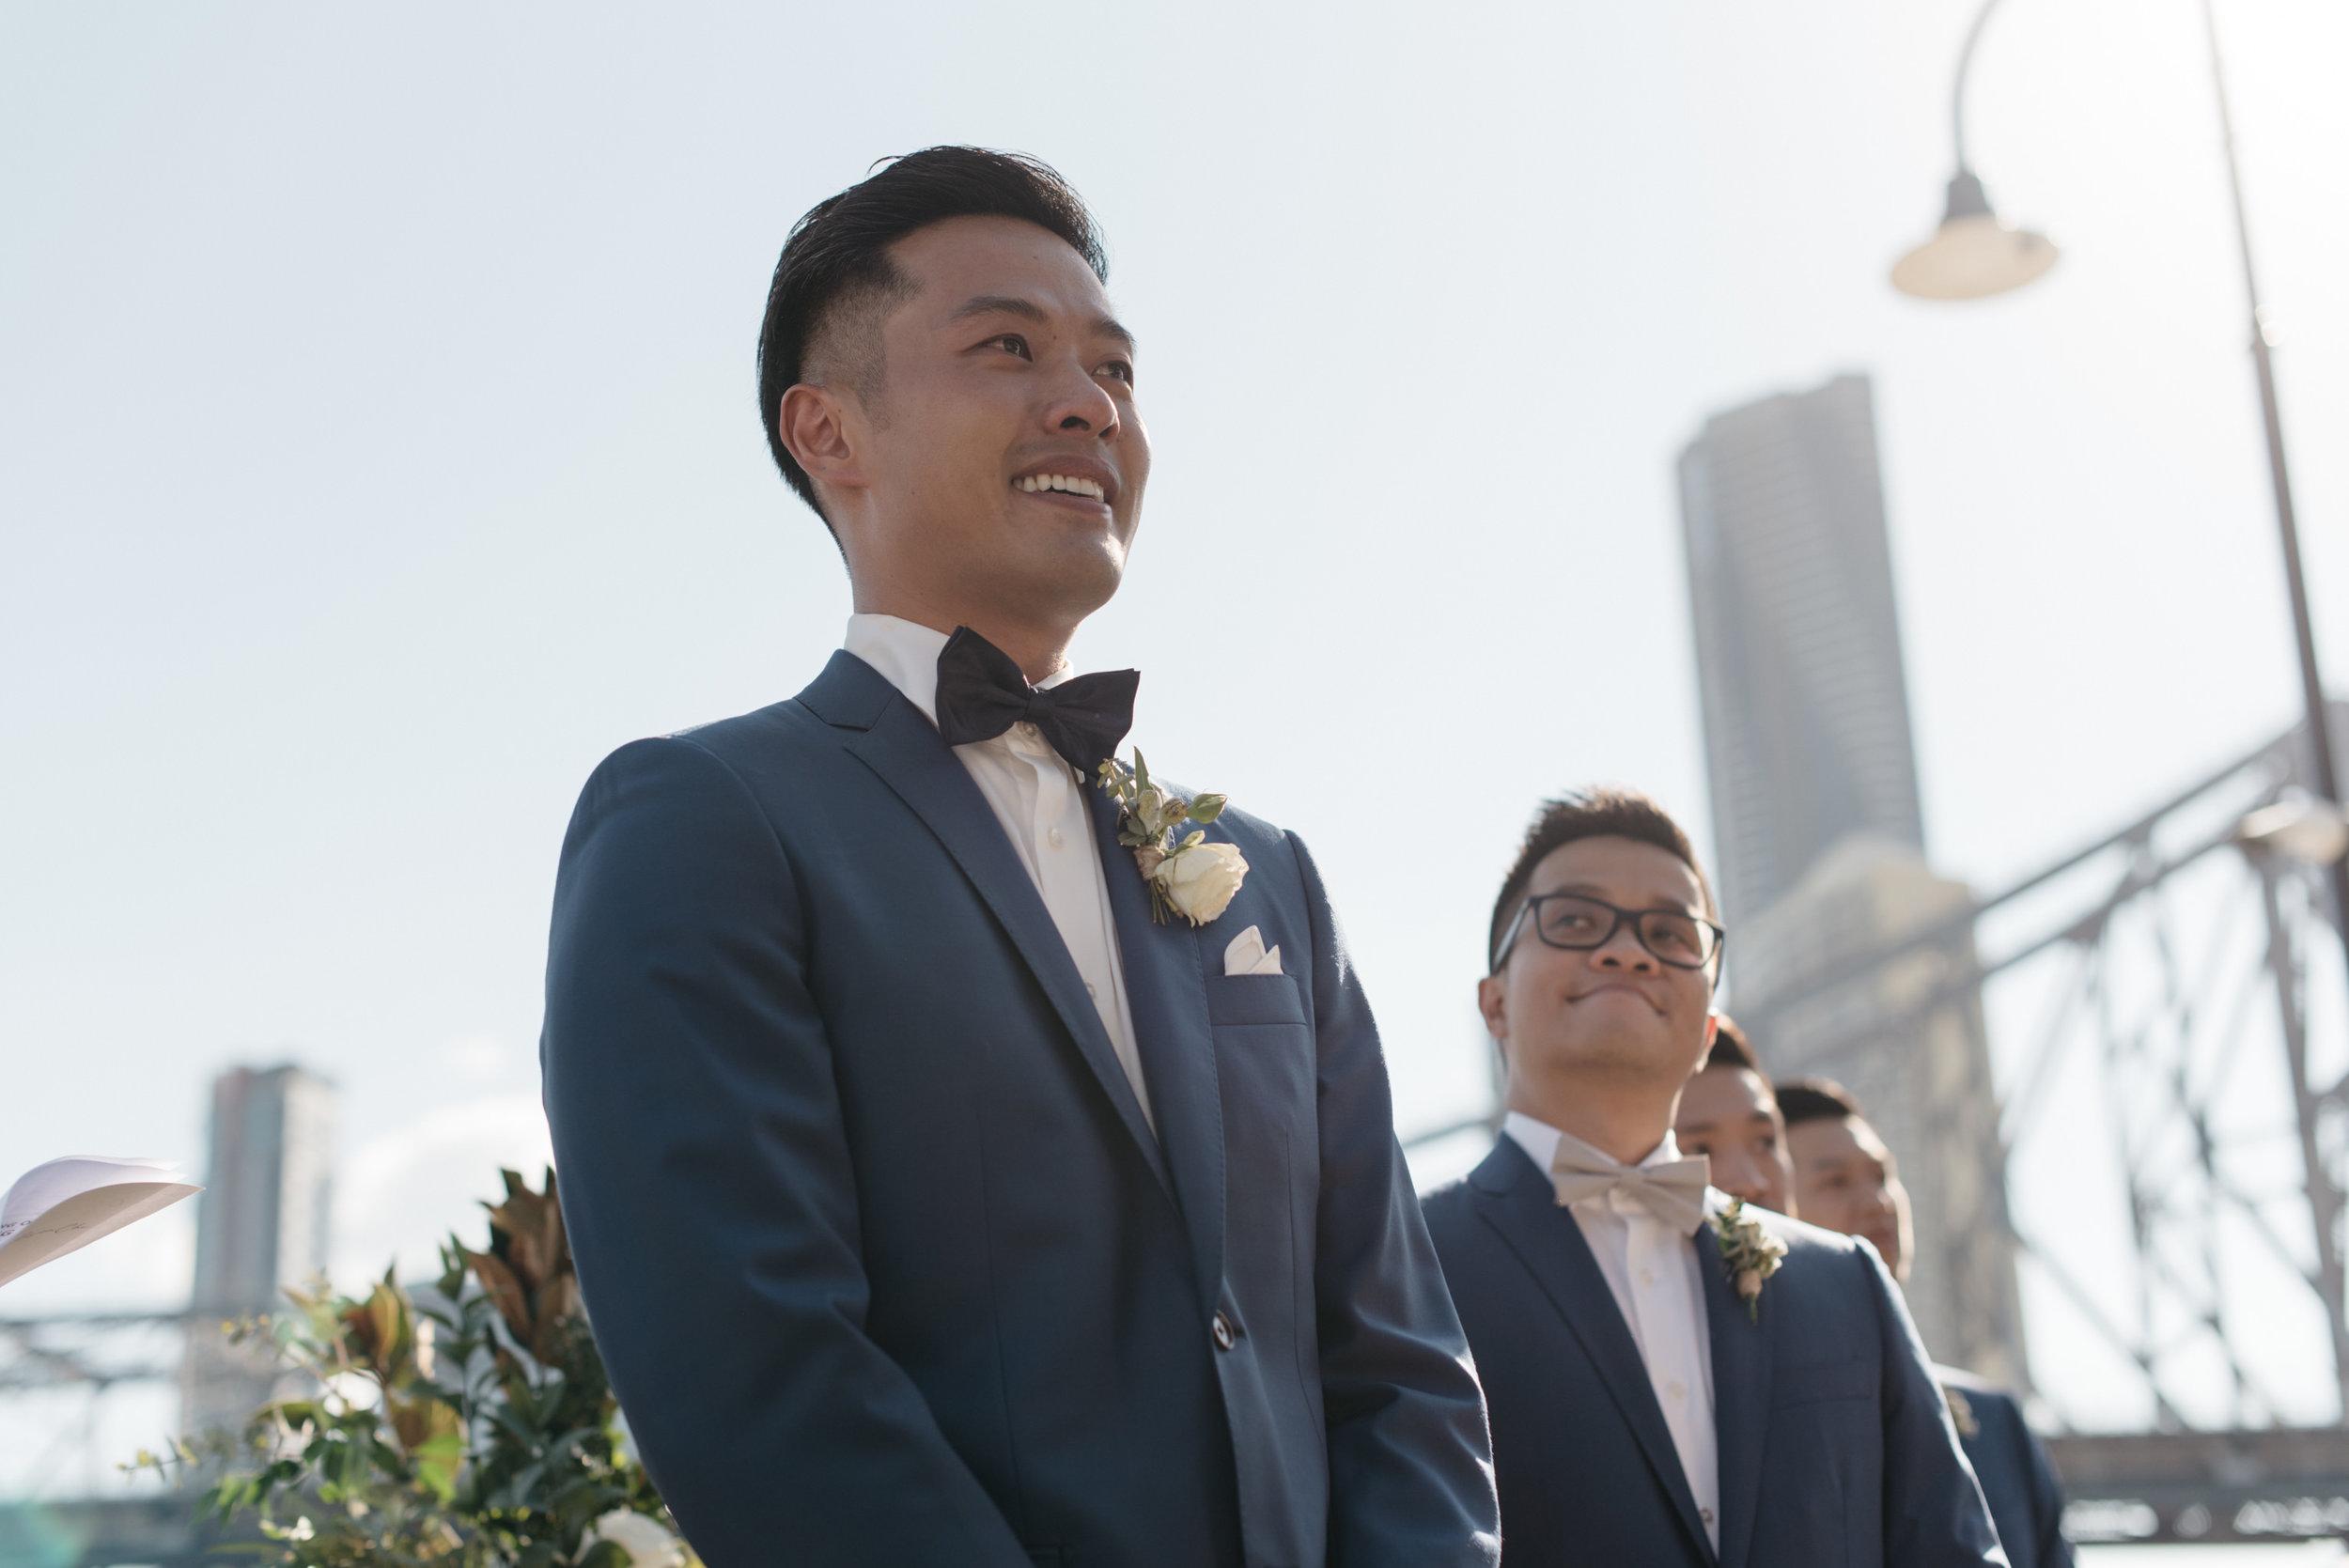 Groom reaction, Howard Smith Wharves, Brisbane Wedding, Ephemeral Creative